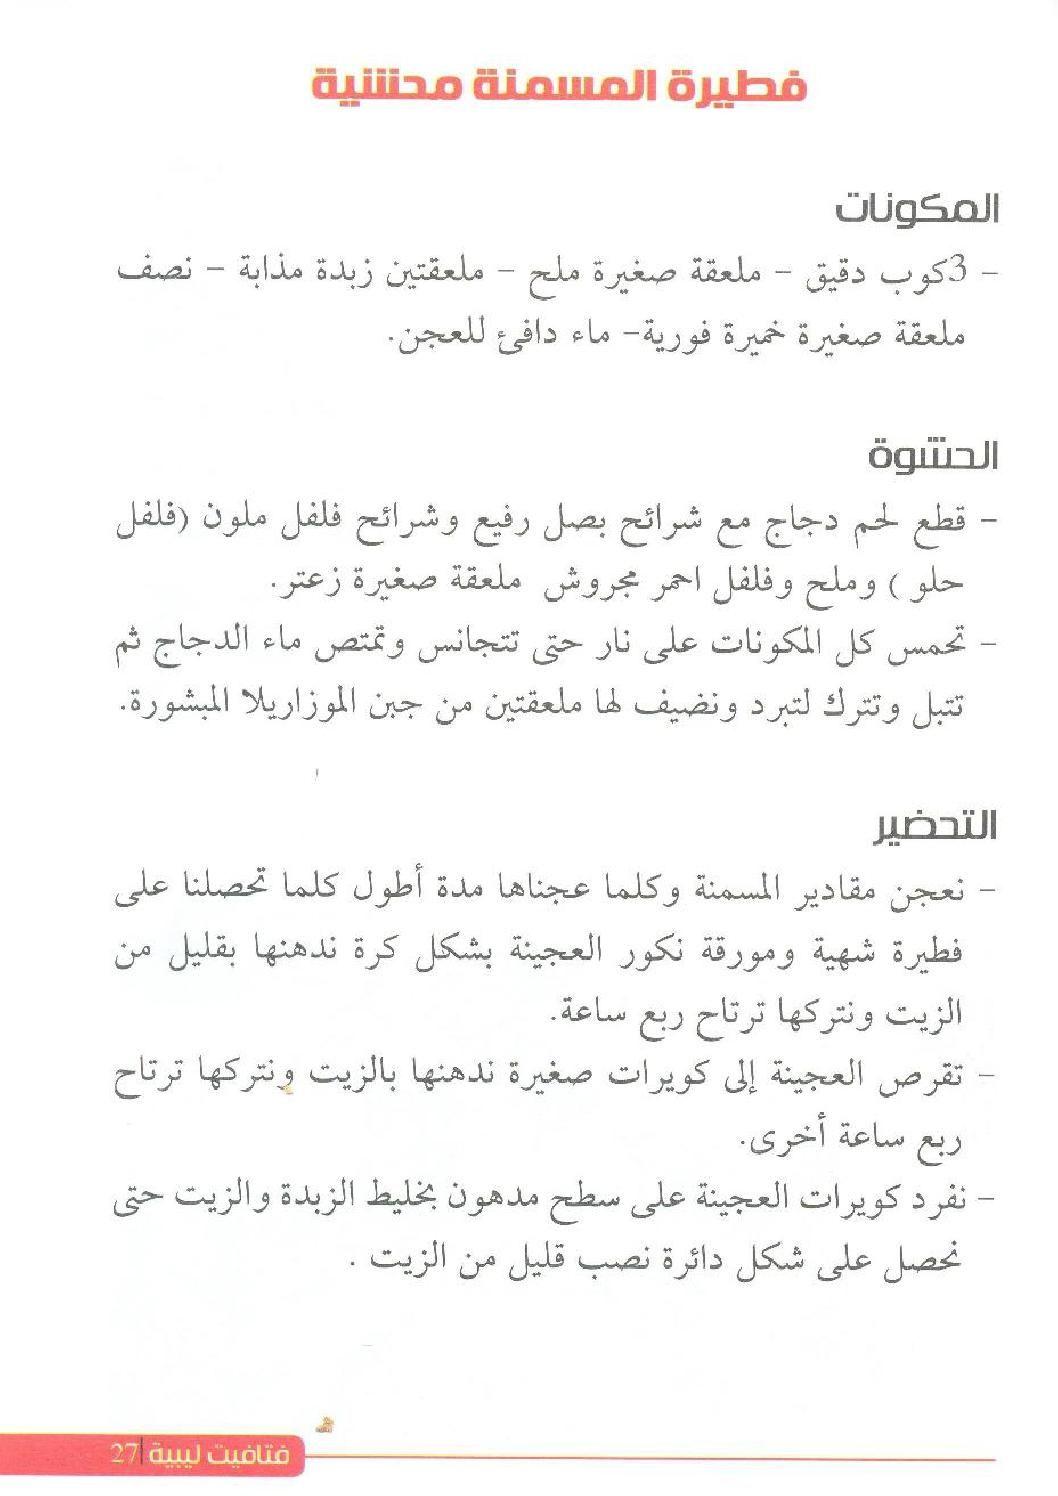 Pdf Print كتاب فتافيت ليبية 2016 By ميس الريم Issuu Words Fatafeat Word Search Puzzle